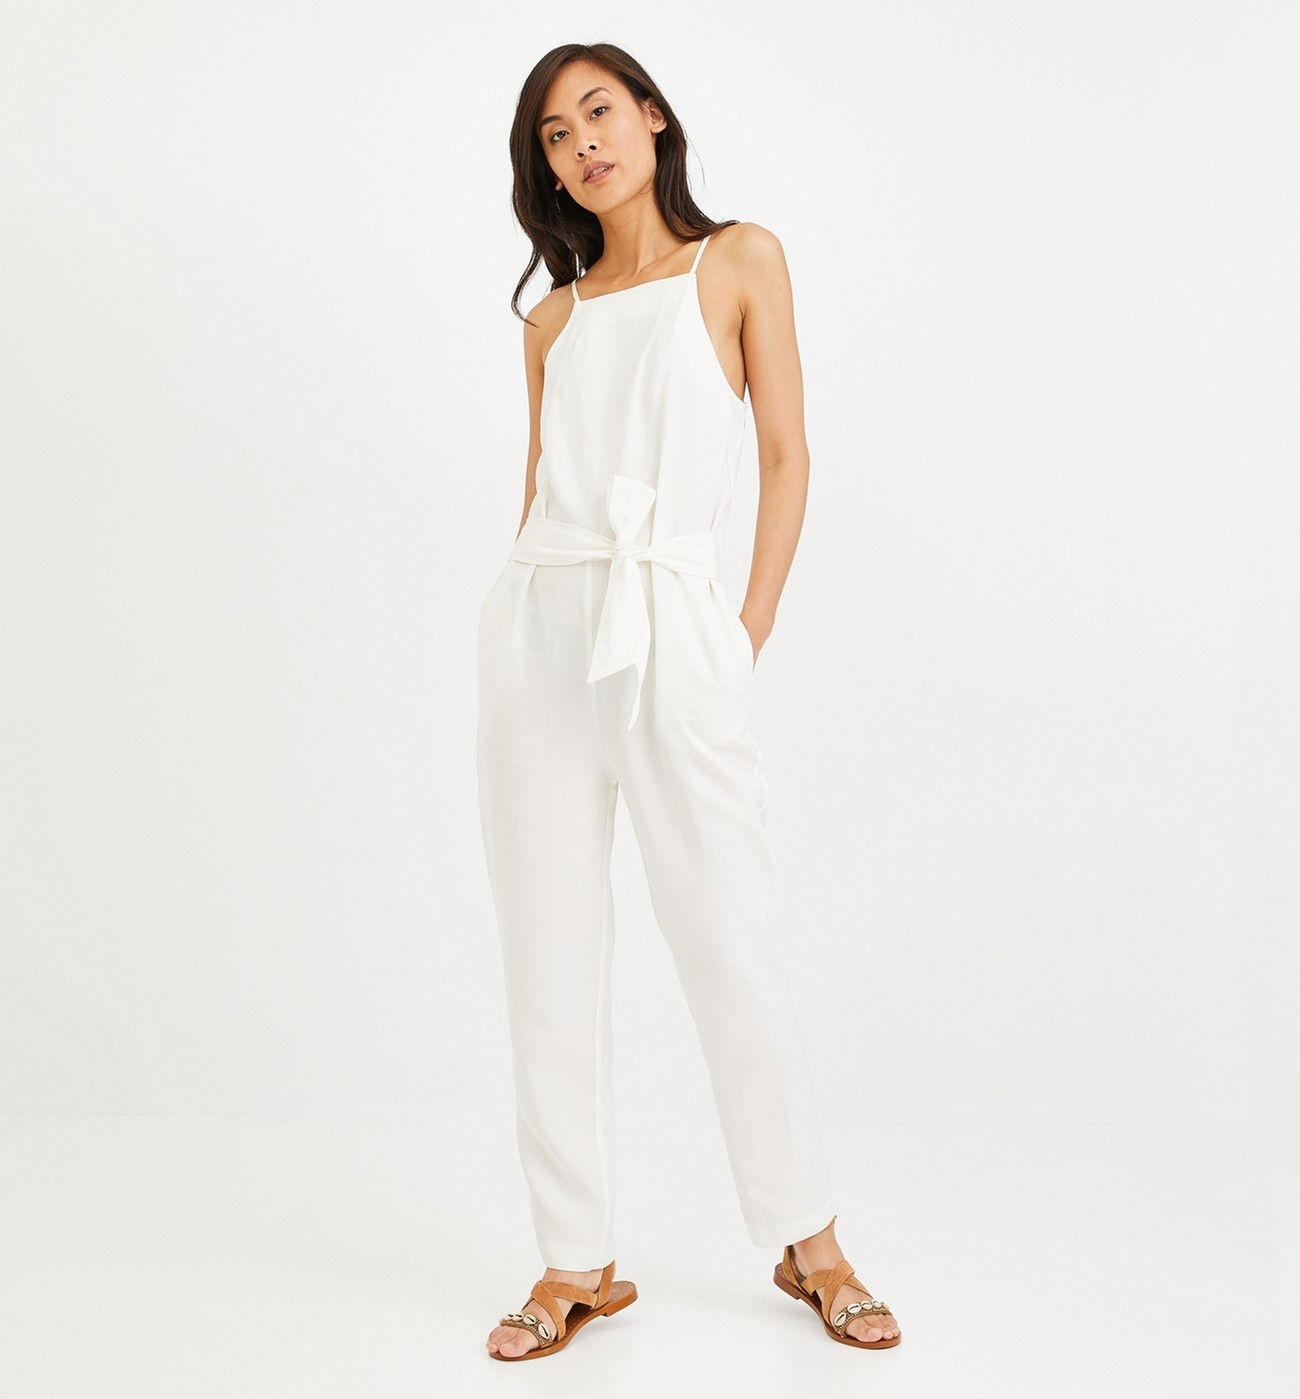 Combinaison Promod pantalon Femme Combinaison Promod T1cFKJl